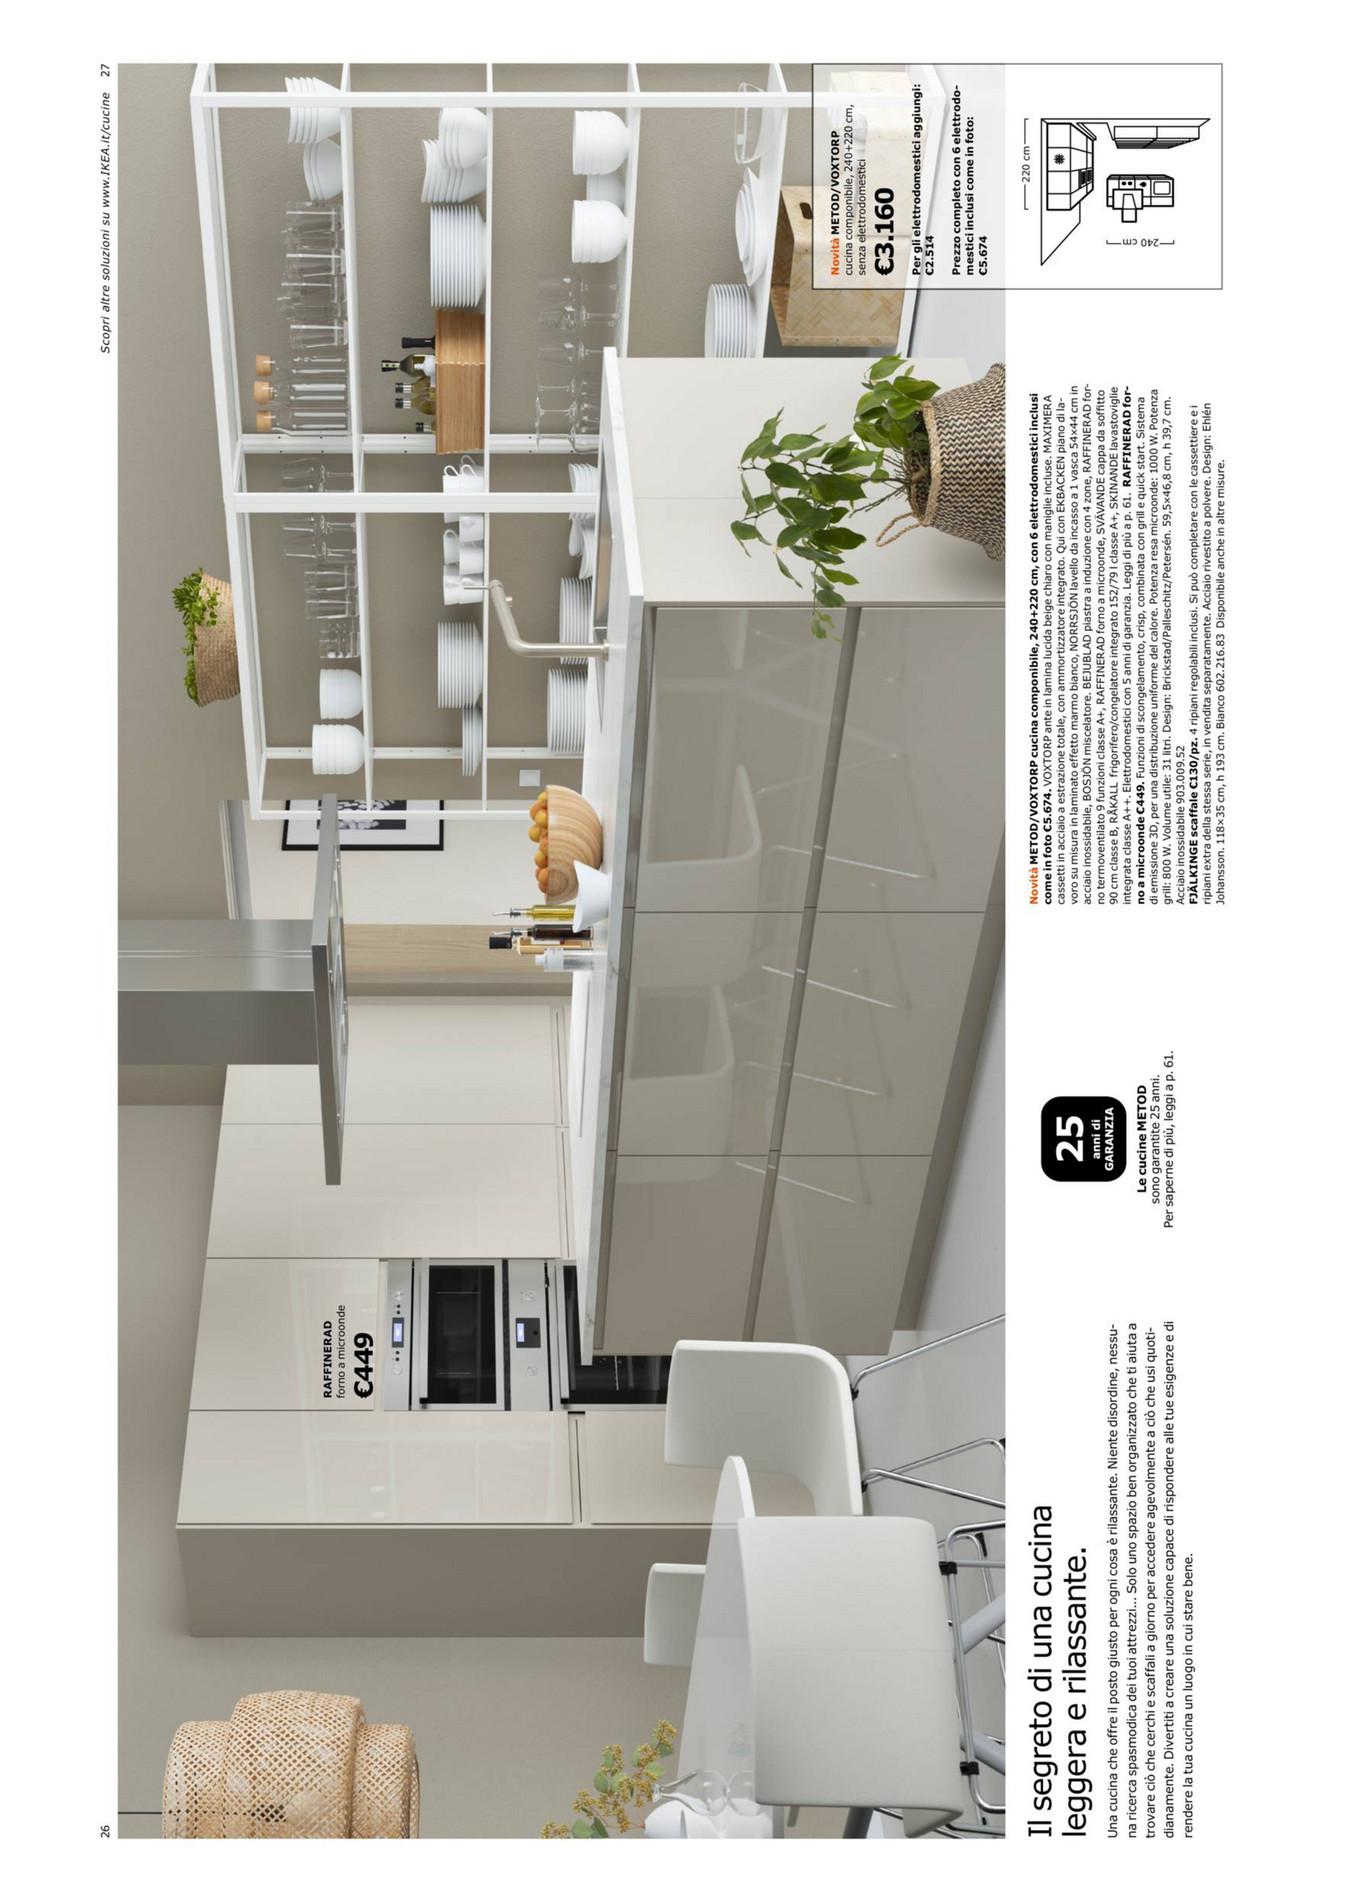 VolantinoFacile - Catalogo Ikea Cucine 2017 - Pagina 14-15